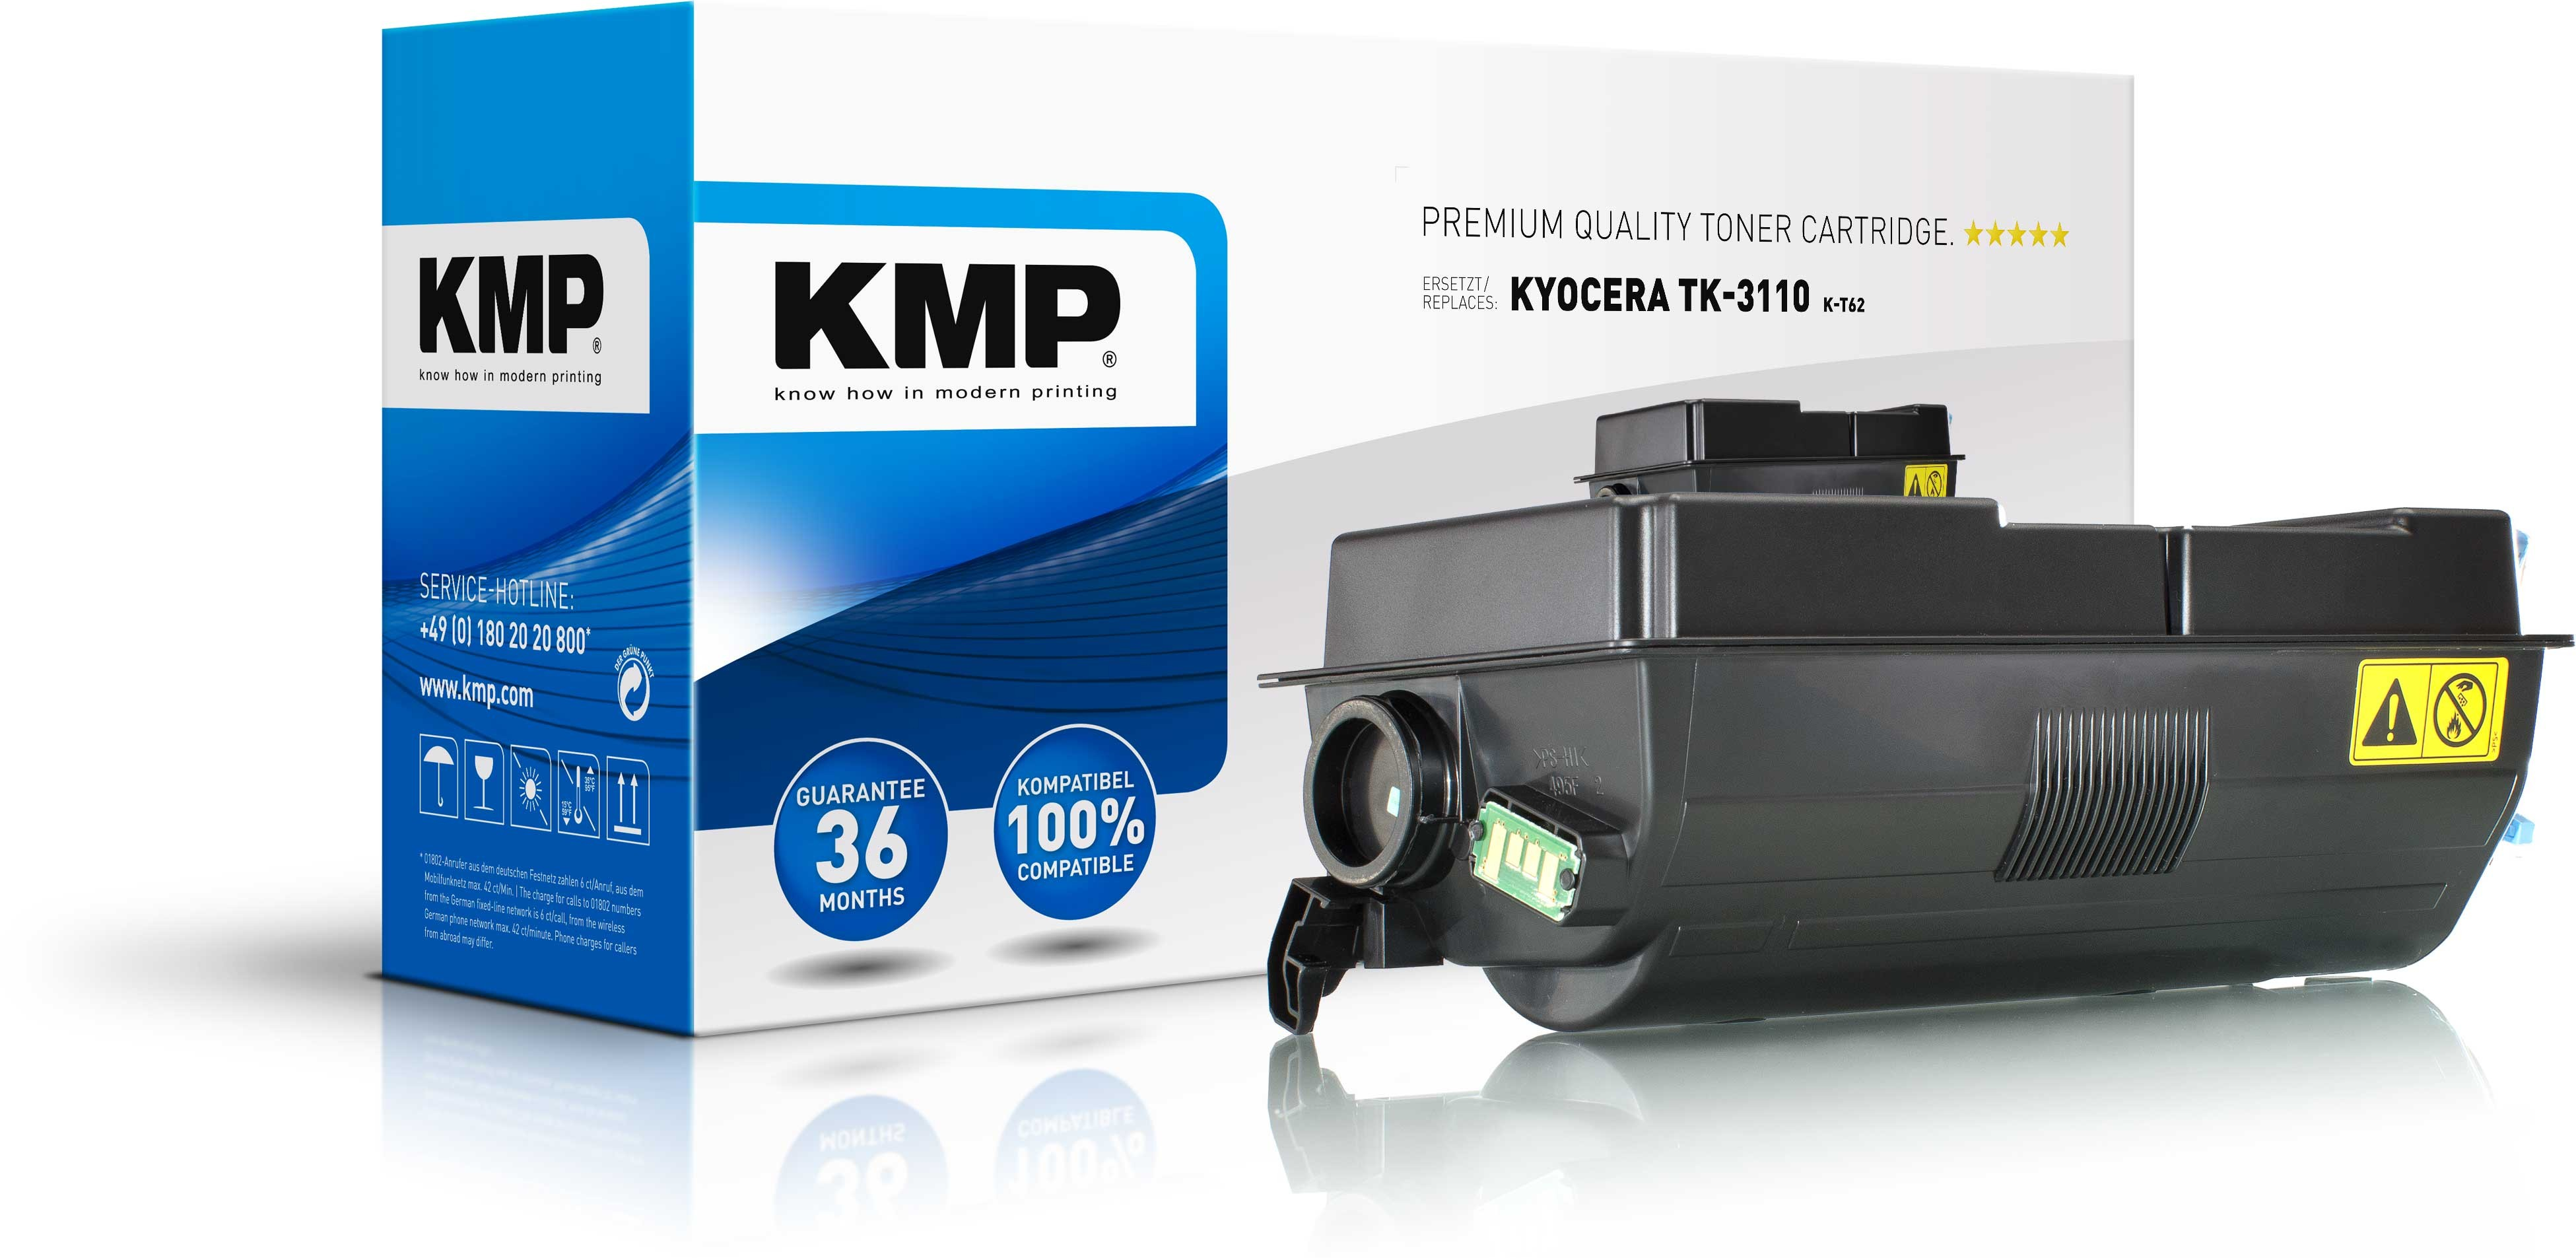 KMP Toner K-T62 für Kyocera TK-3110 FS-4100D etc. black